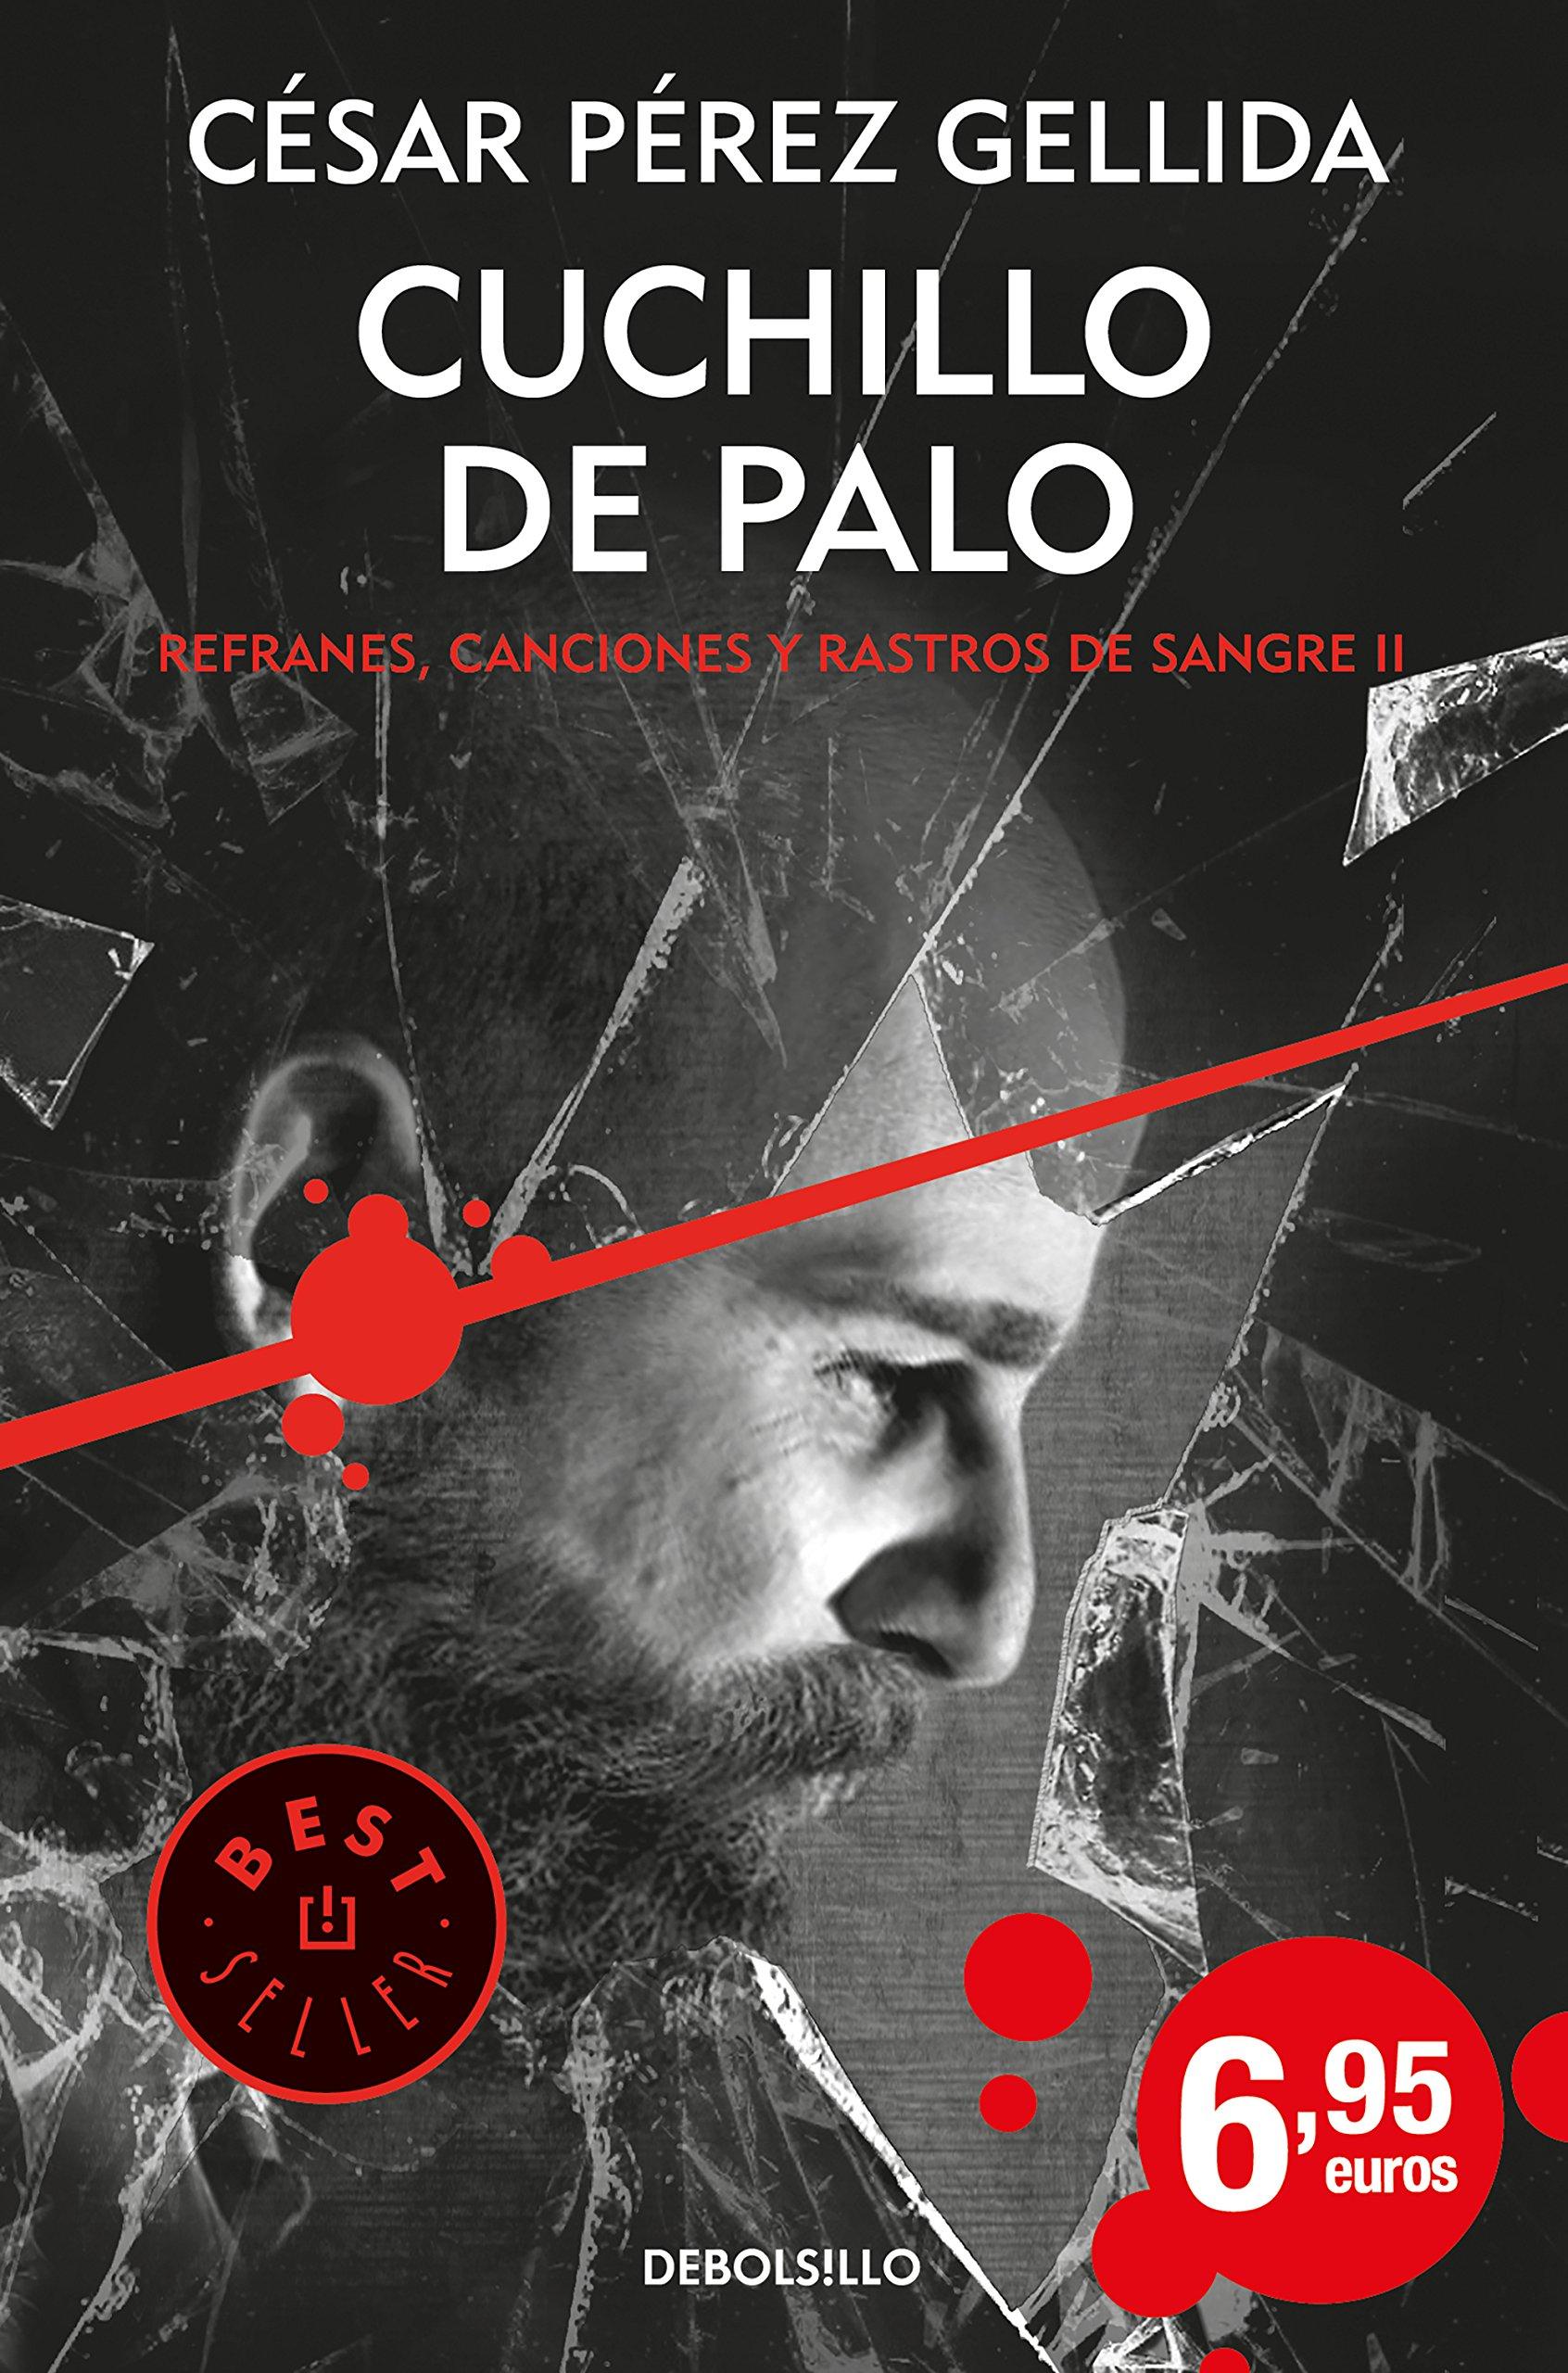 Amazon.com: Cuchillo de palo (9788466341943): Cesar Pérez ...